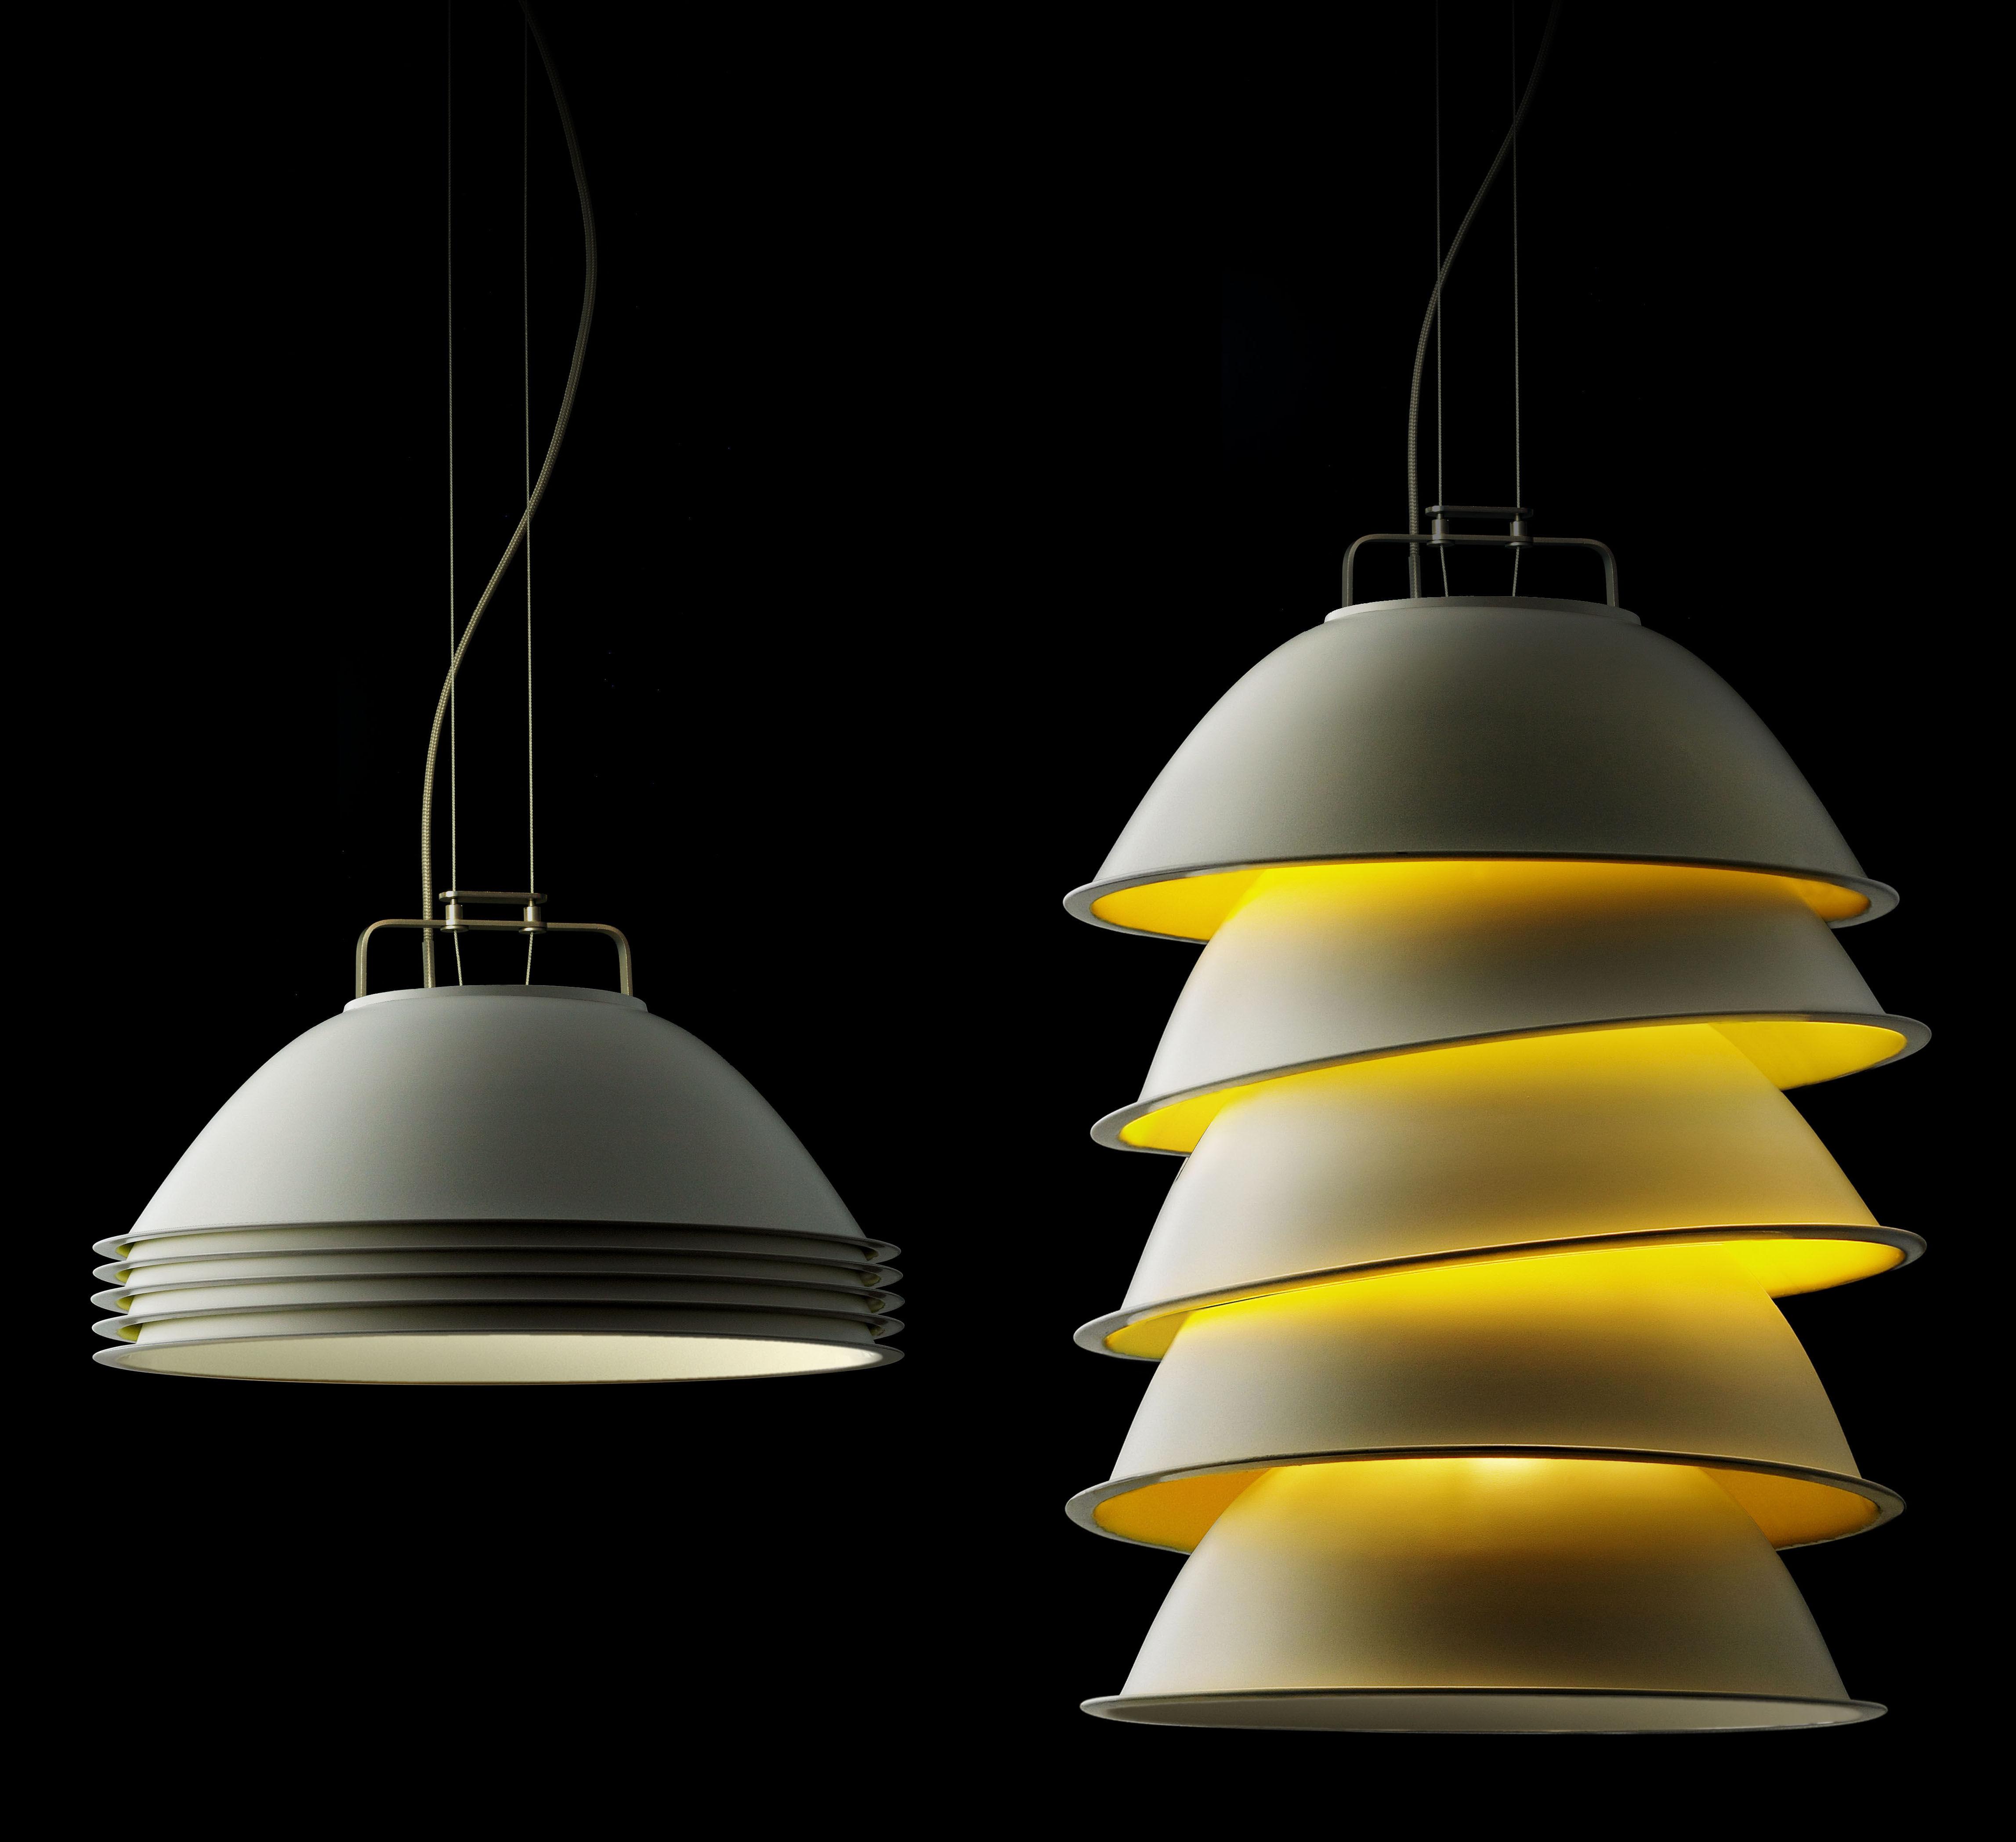 Lighting - Pendant Lighting - Five Pack Pendant by Ingo Maurer - White - Yellow - Steel